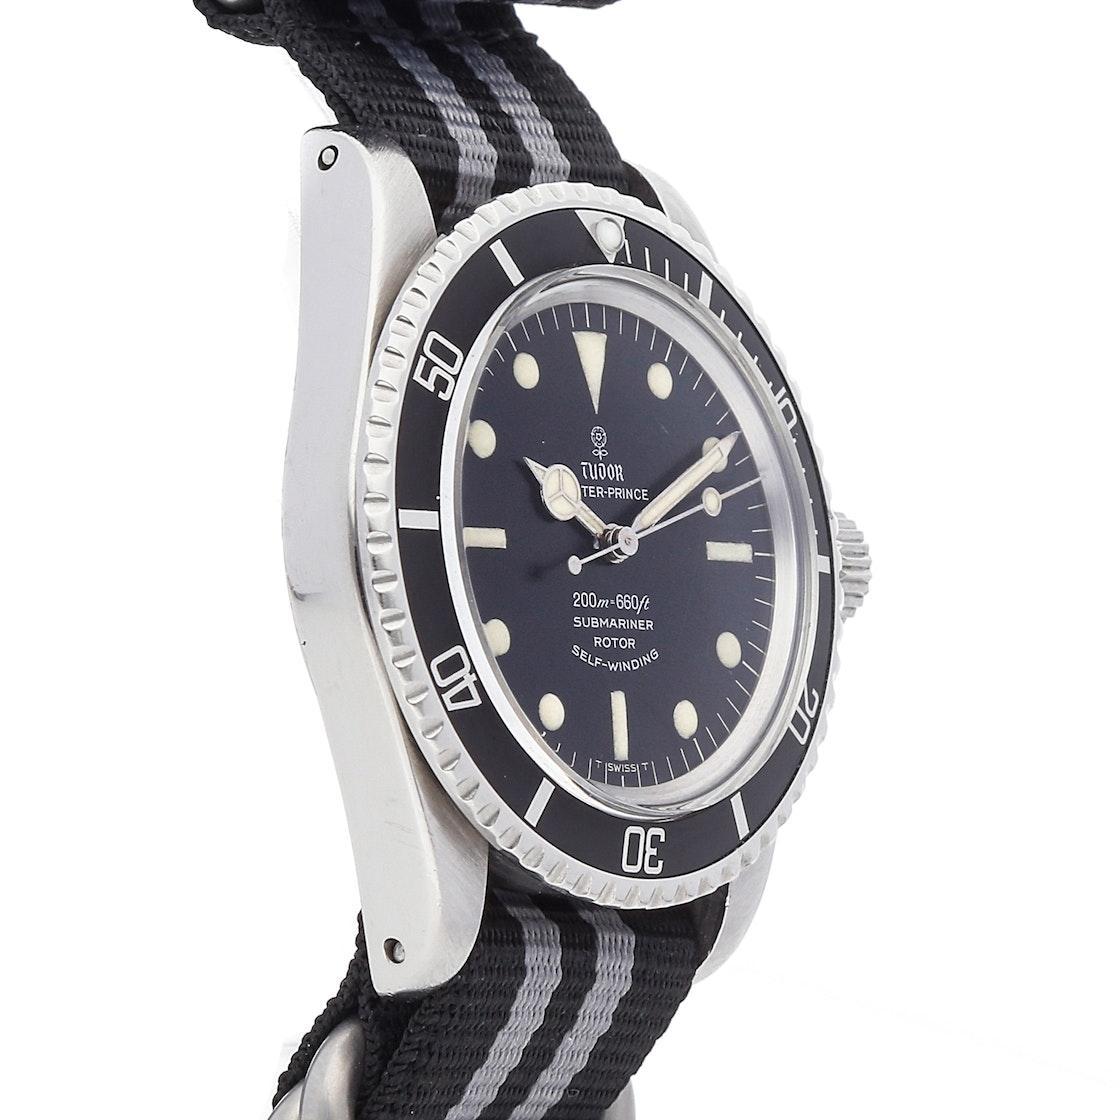 Tudor Oyster Prince Submariner 7928